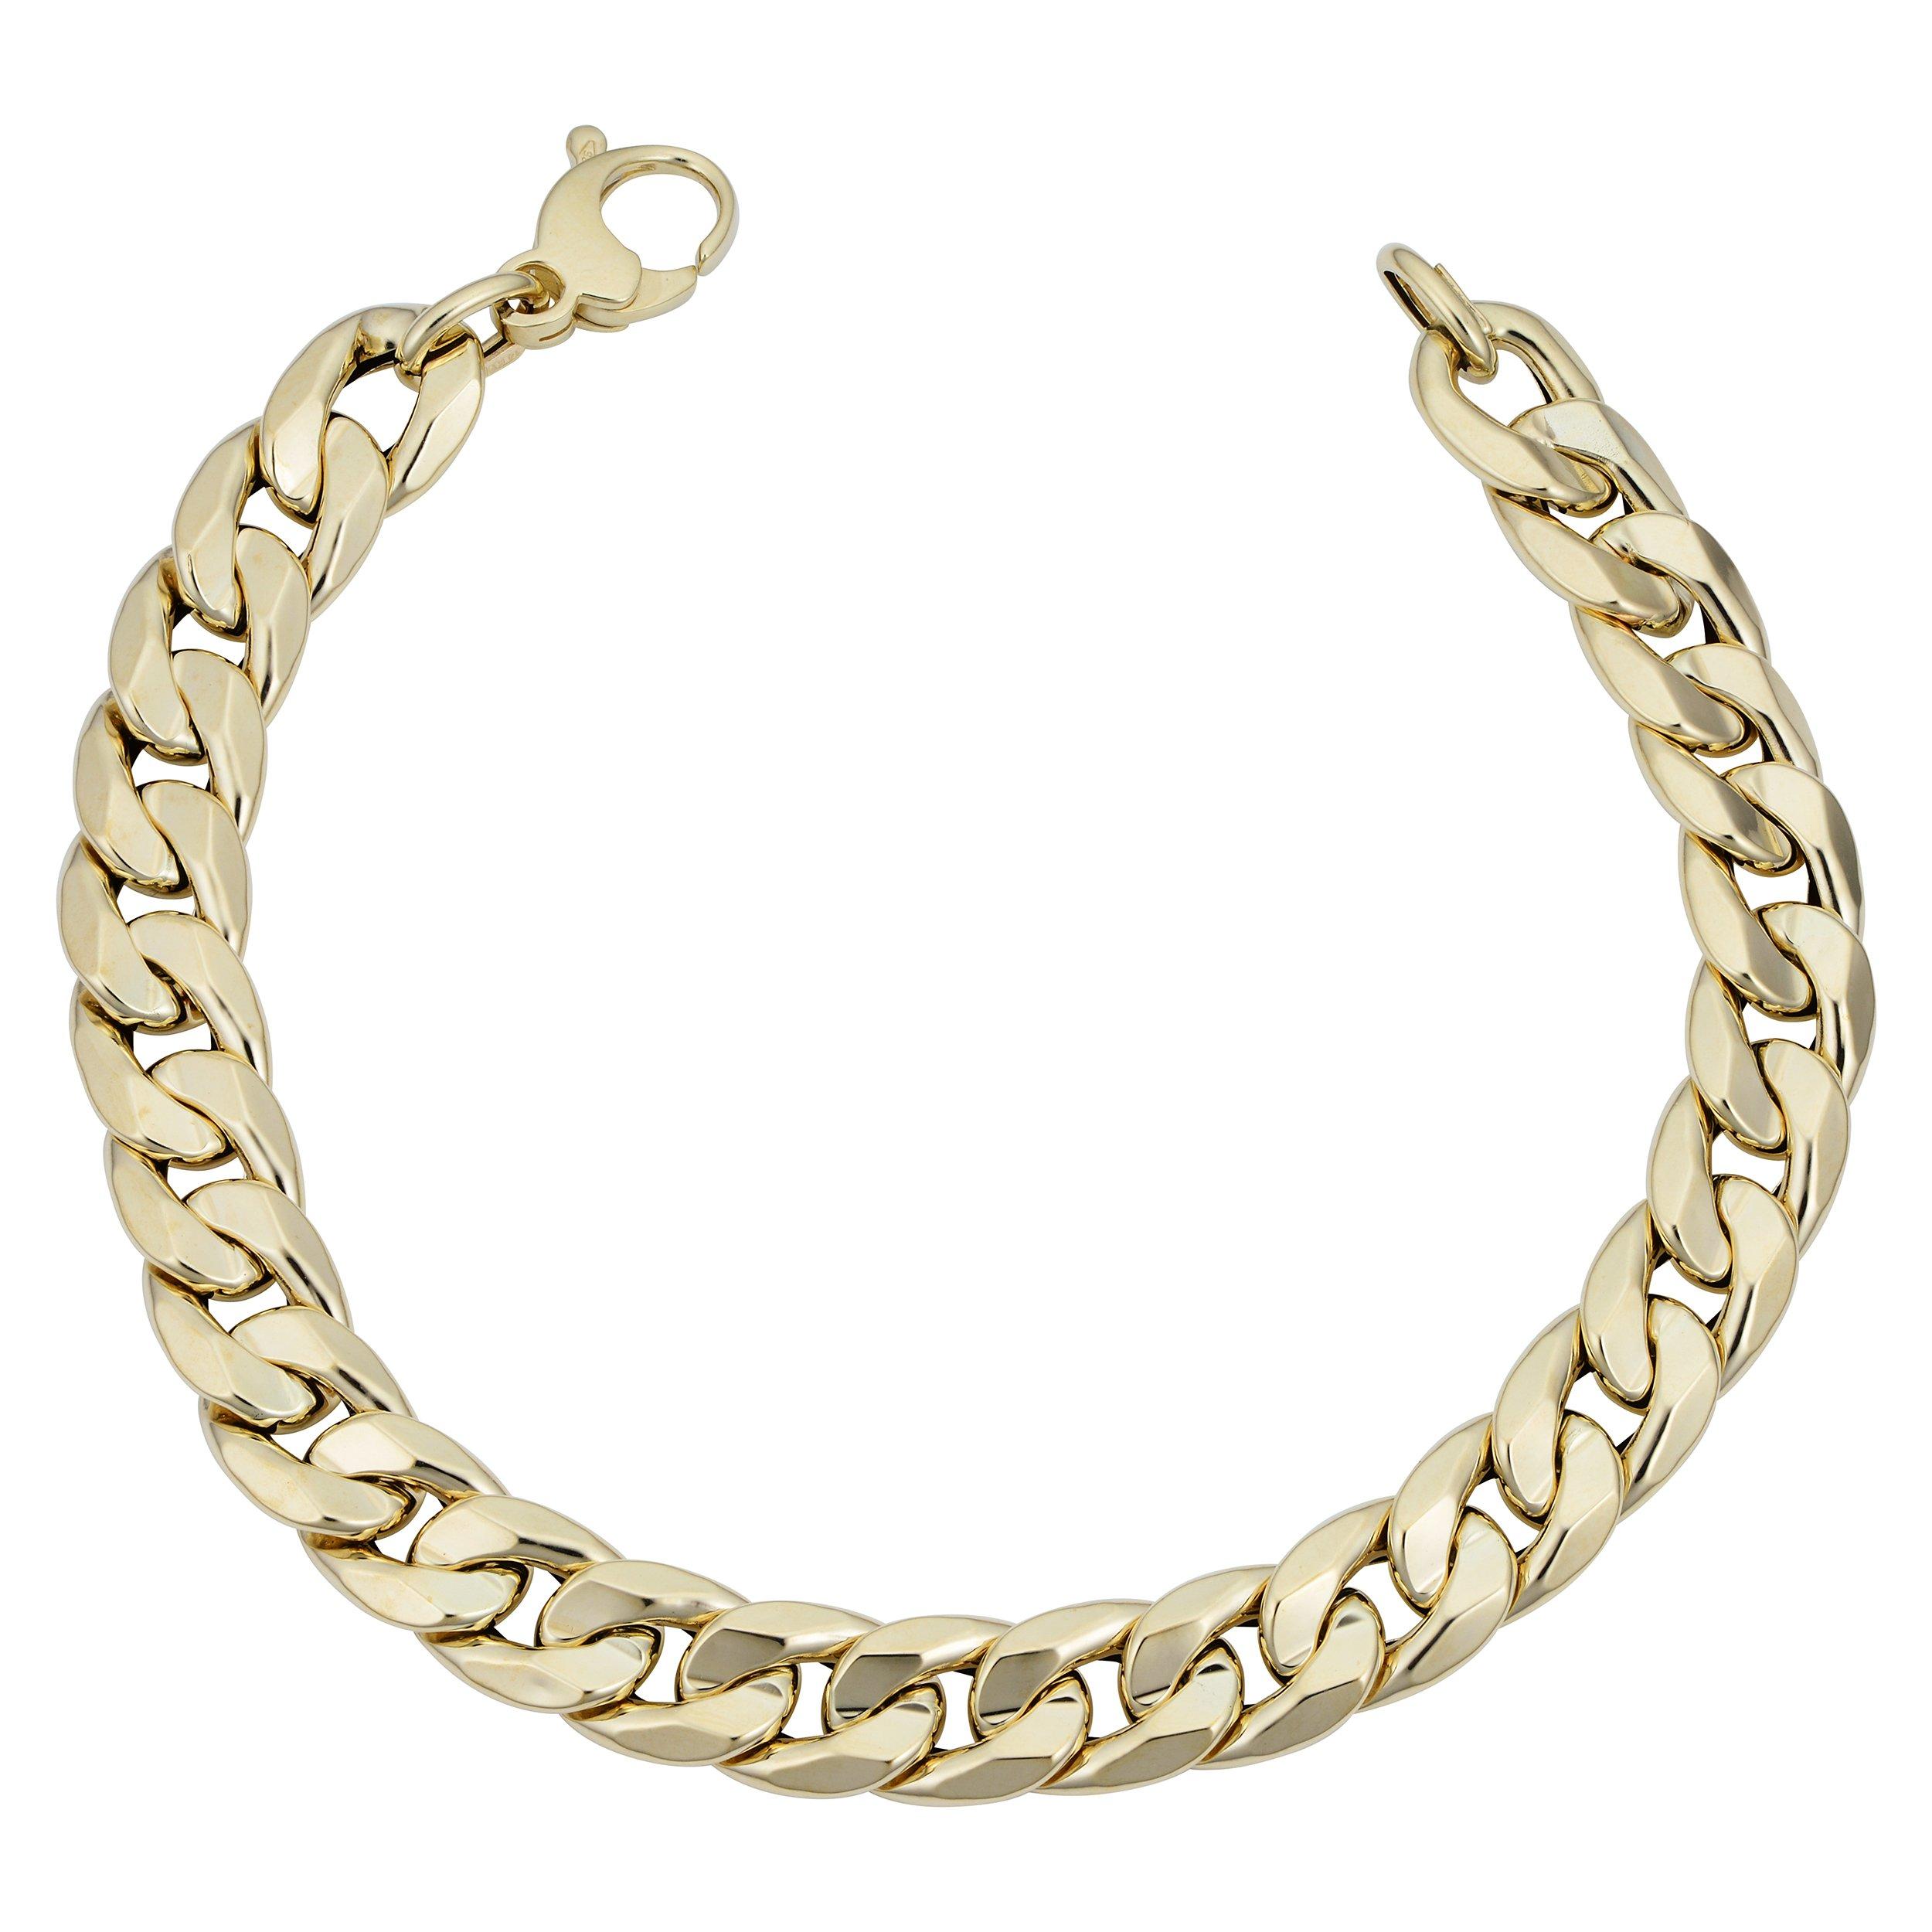 Mens 14k Yellow Gold Cuban Curb Link Bracelet (9.2mm, 8.5 inch) by Kooljewelry (Image #1)